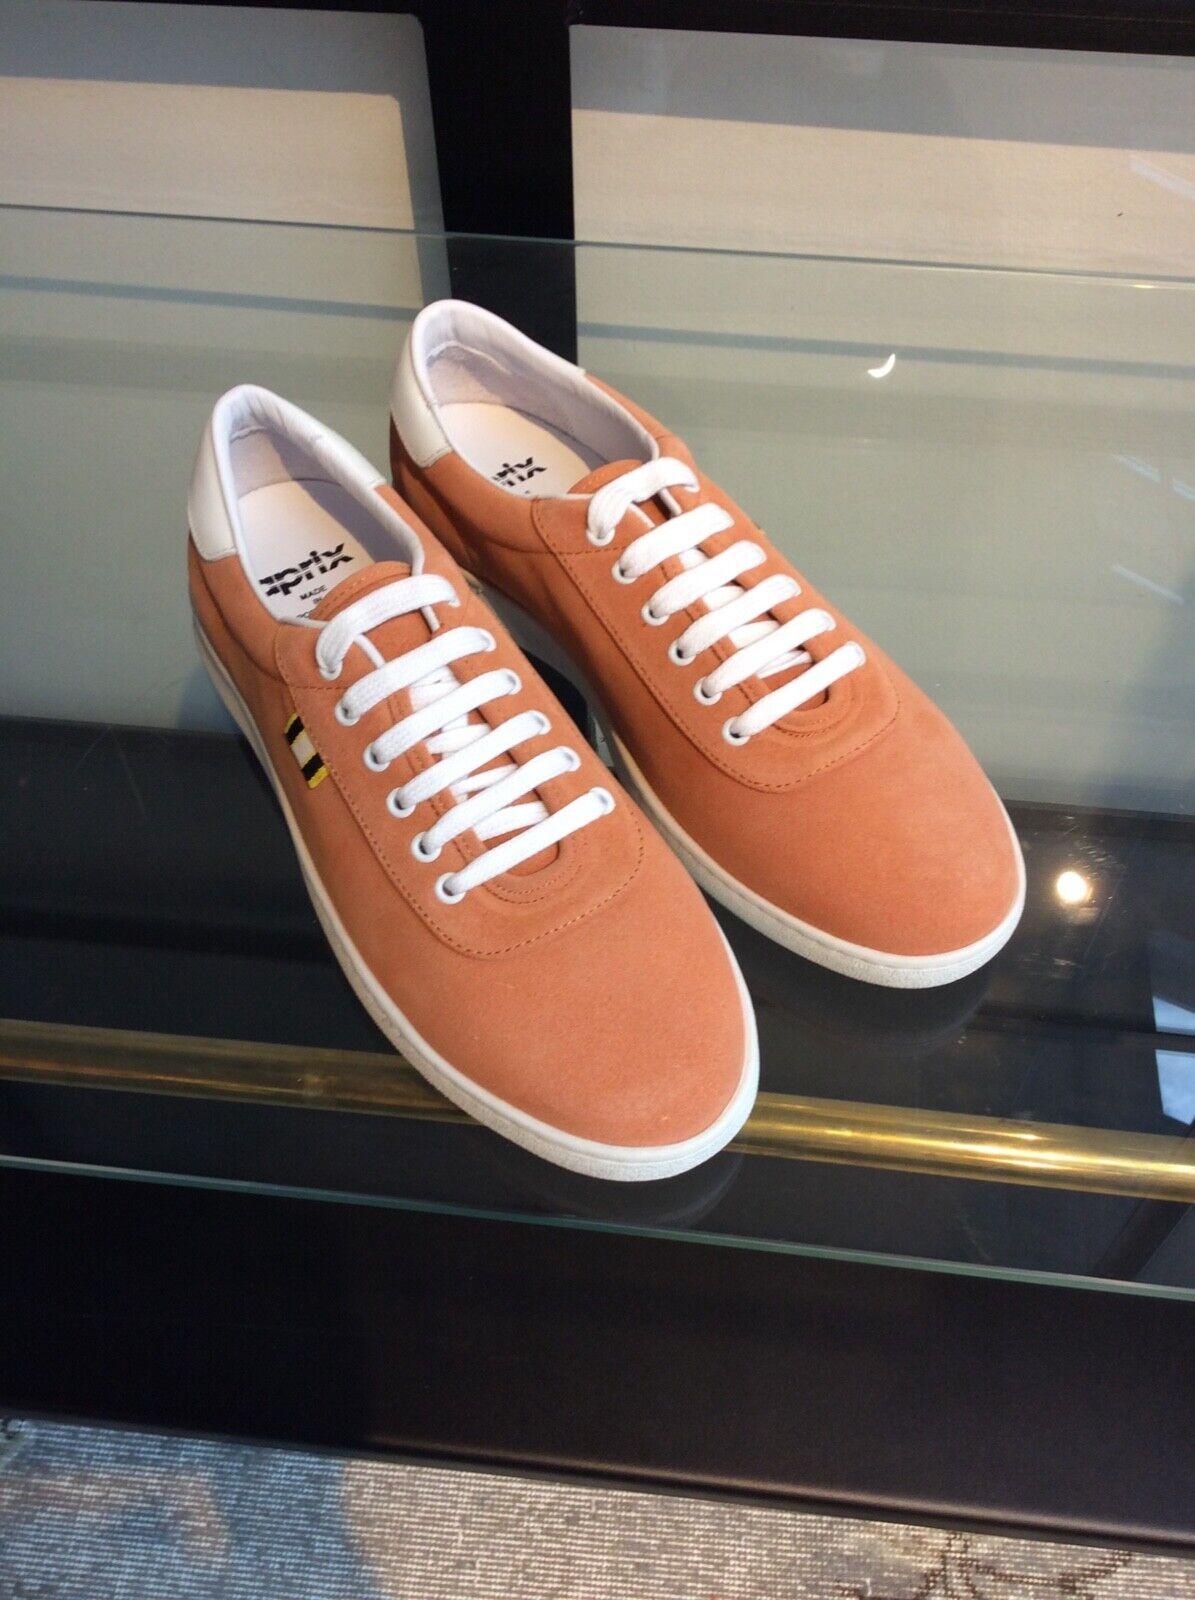 APRIX Turnschuhe Peach Leather Größe 44 new